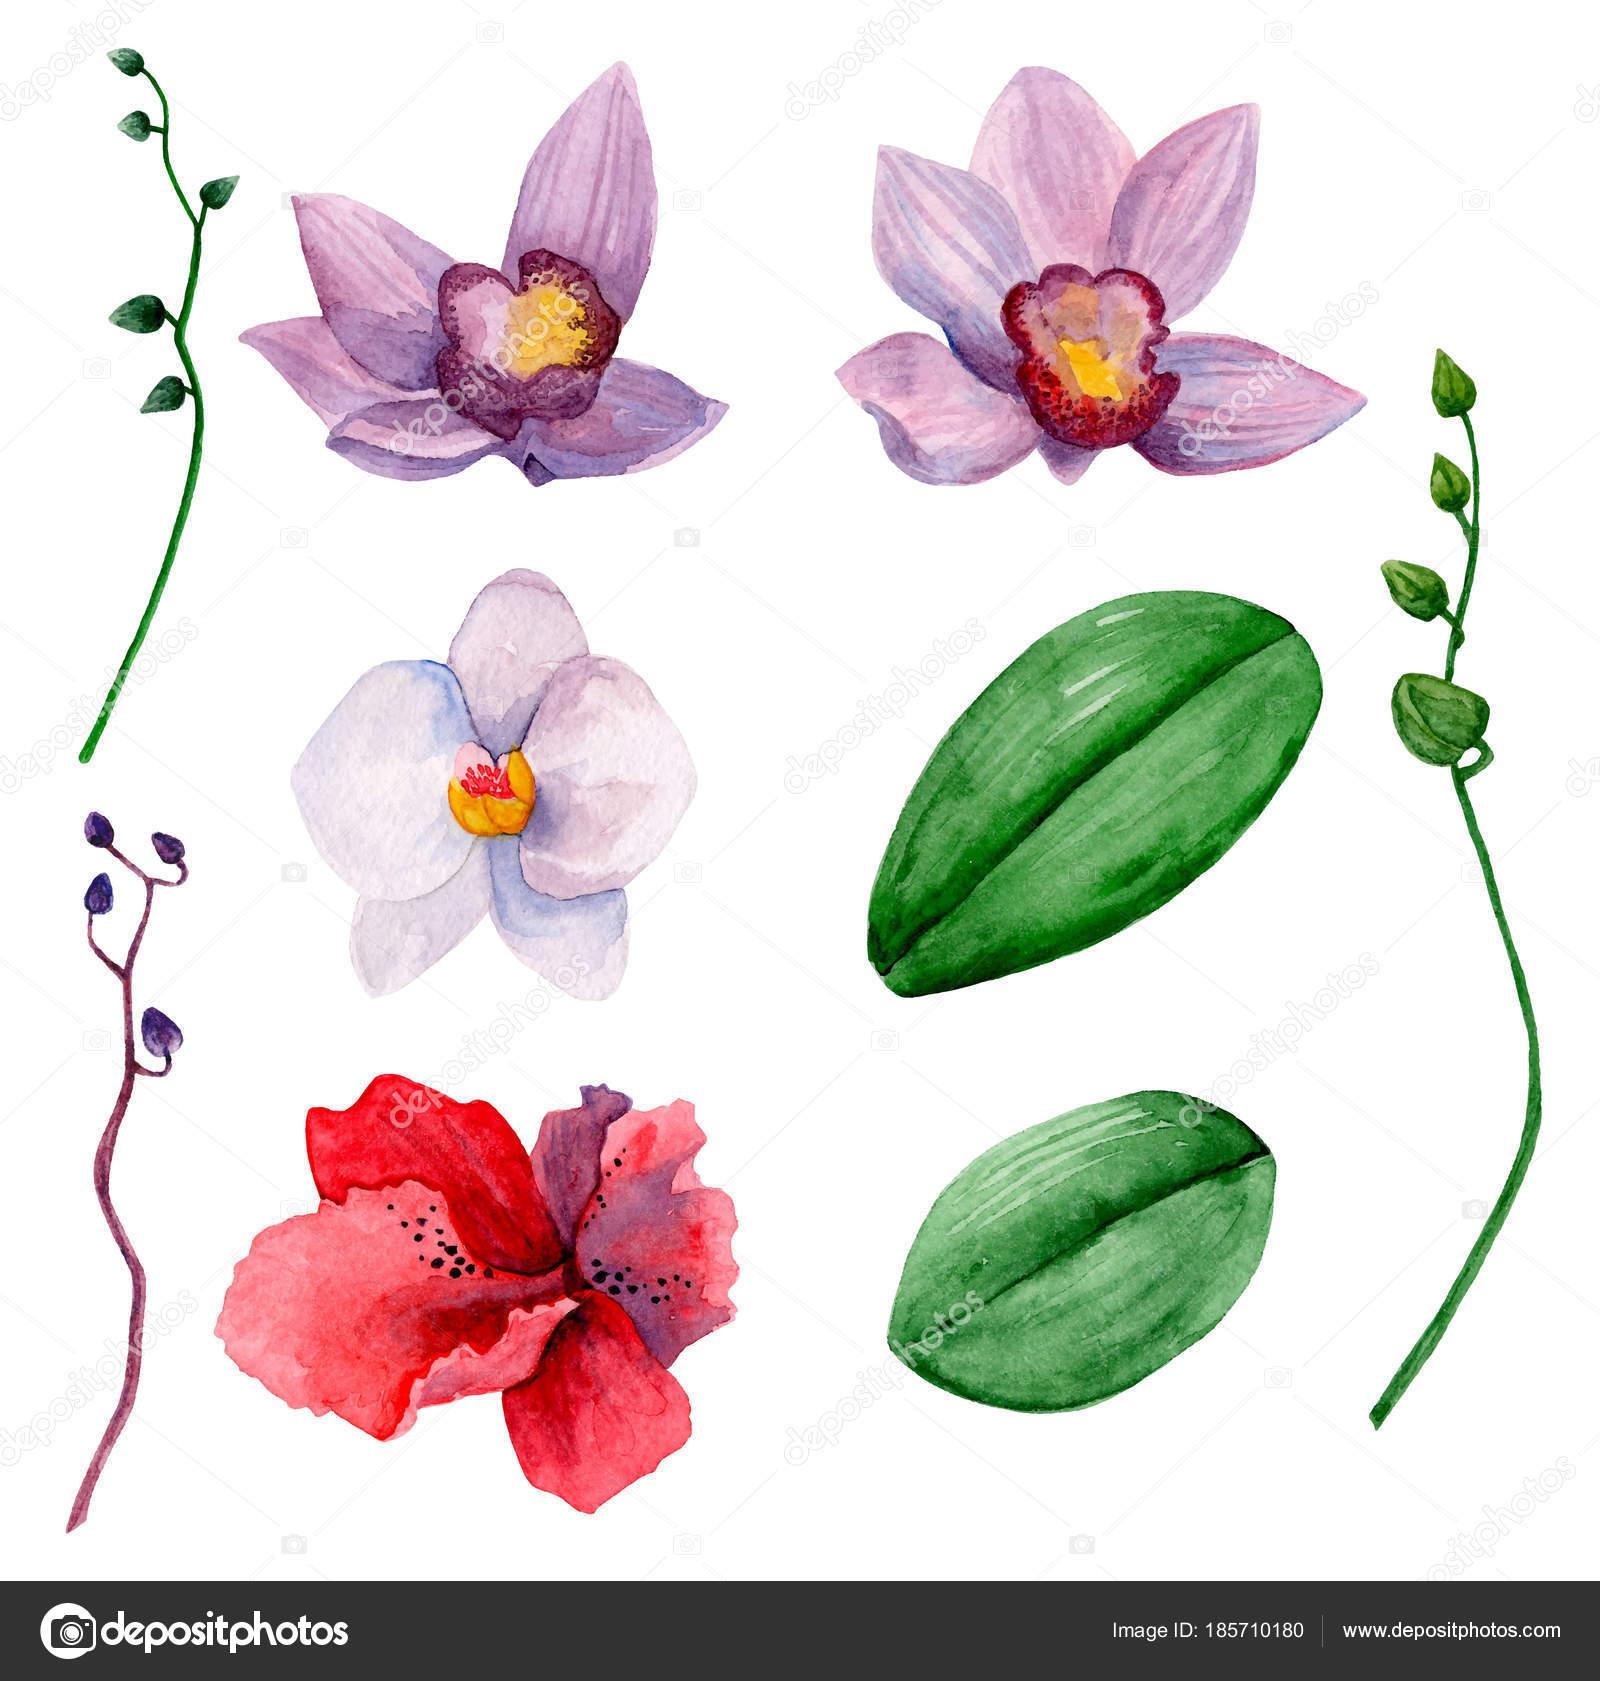 Hawaiian flowers vector clipart watercolor orchids clip art stock hawaiian flowers vector clipart watercolor orchids clip art stock vector izmirmasajfo